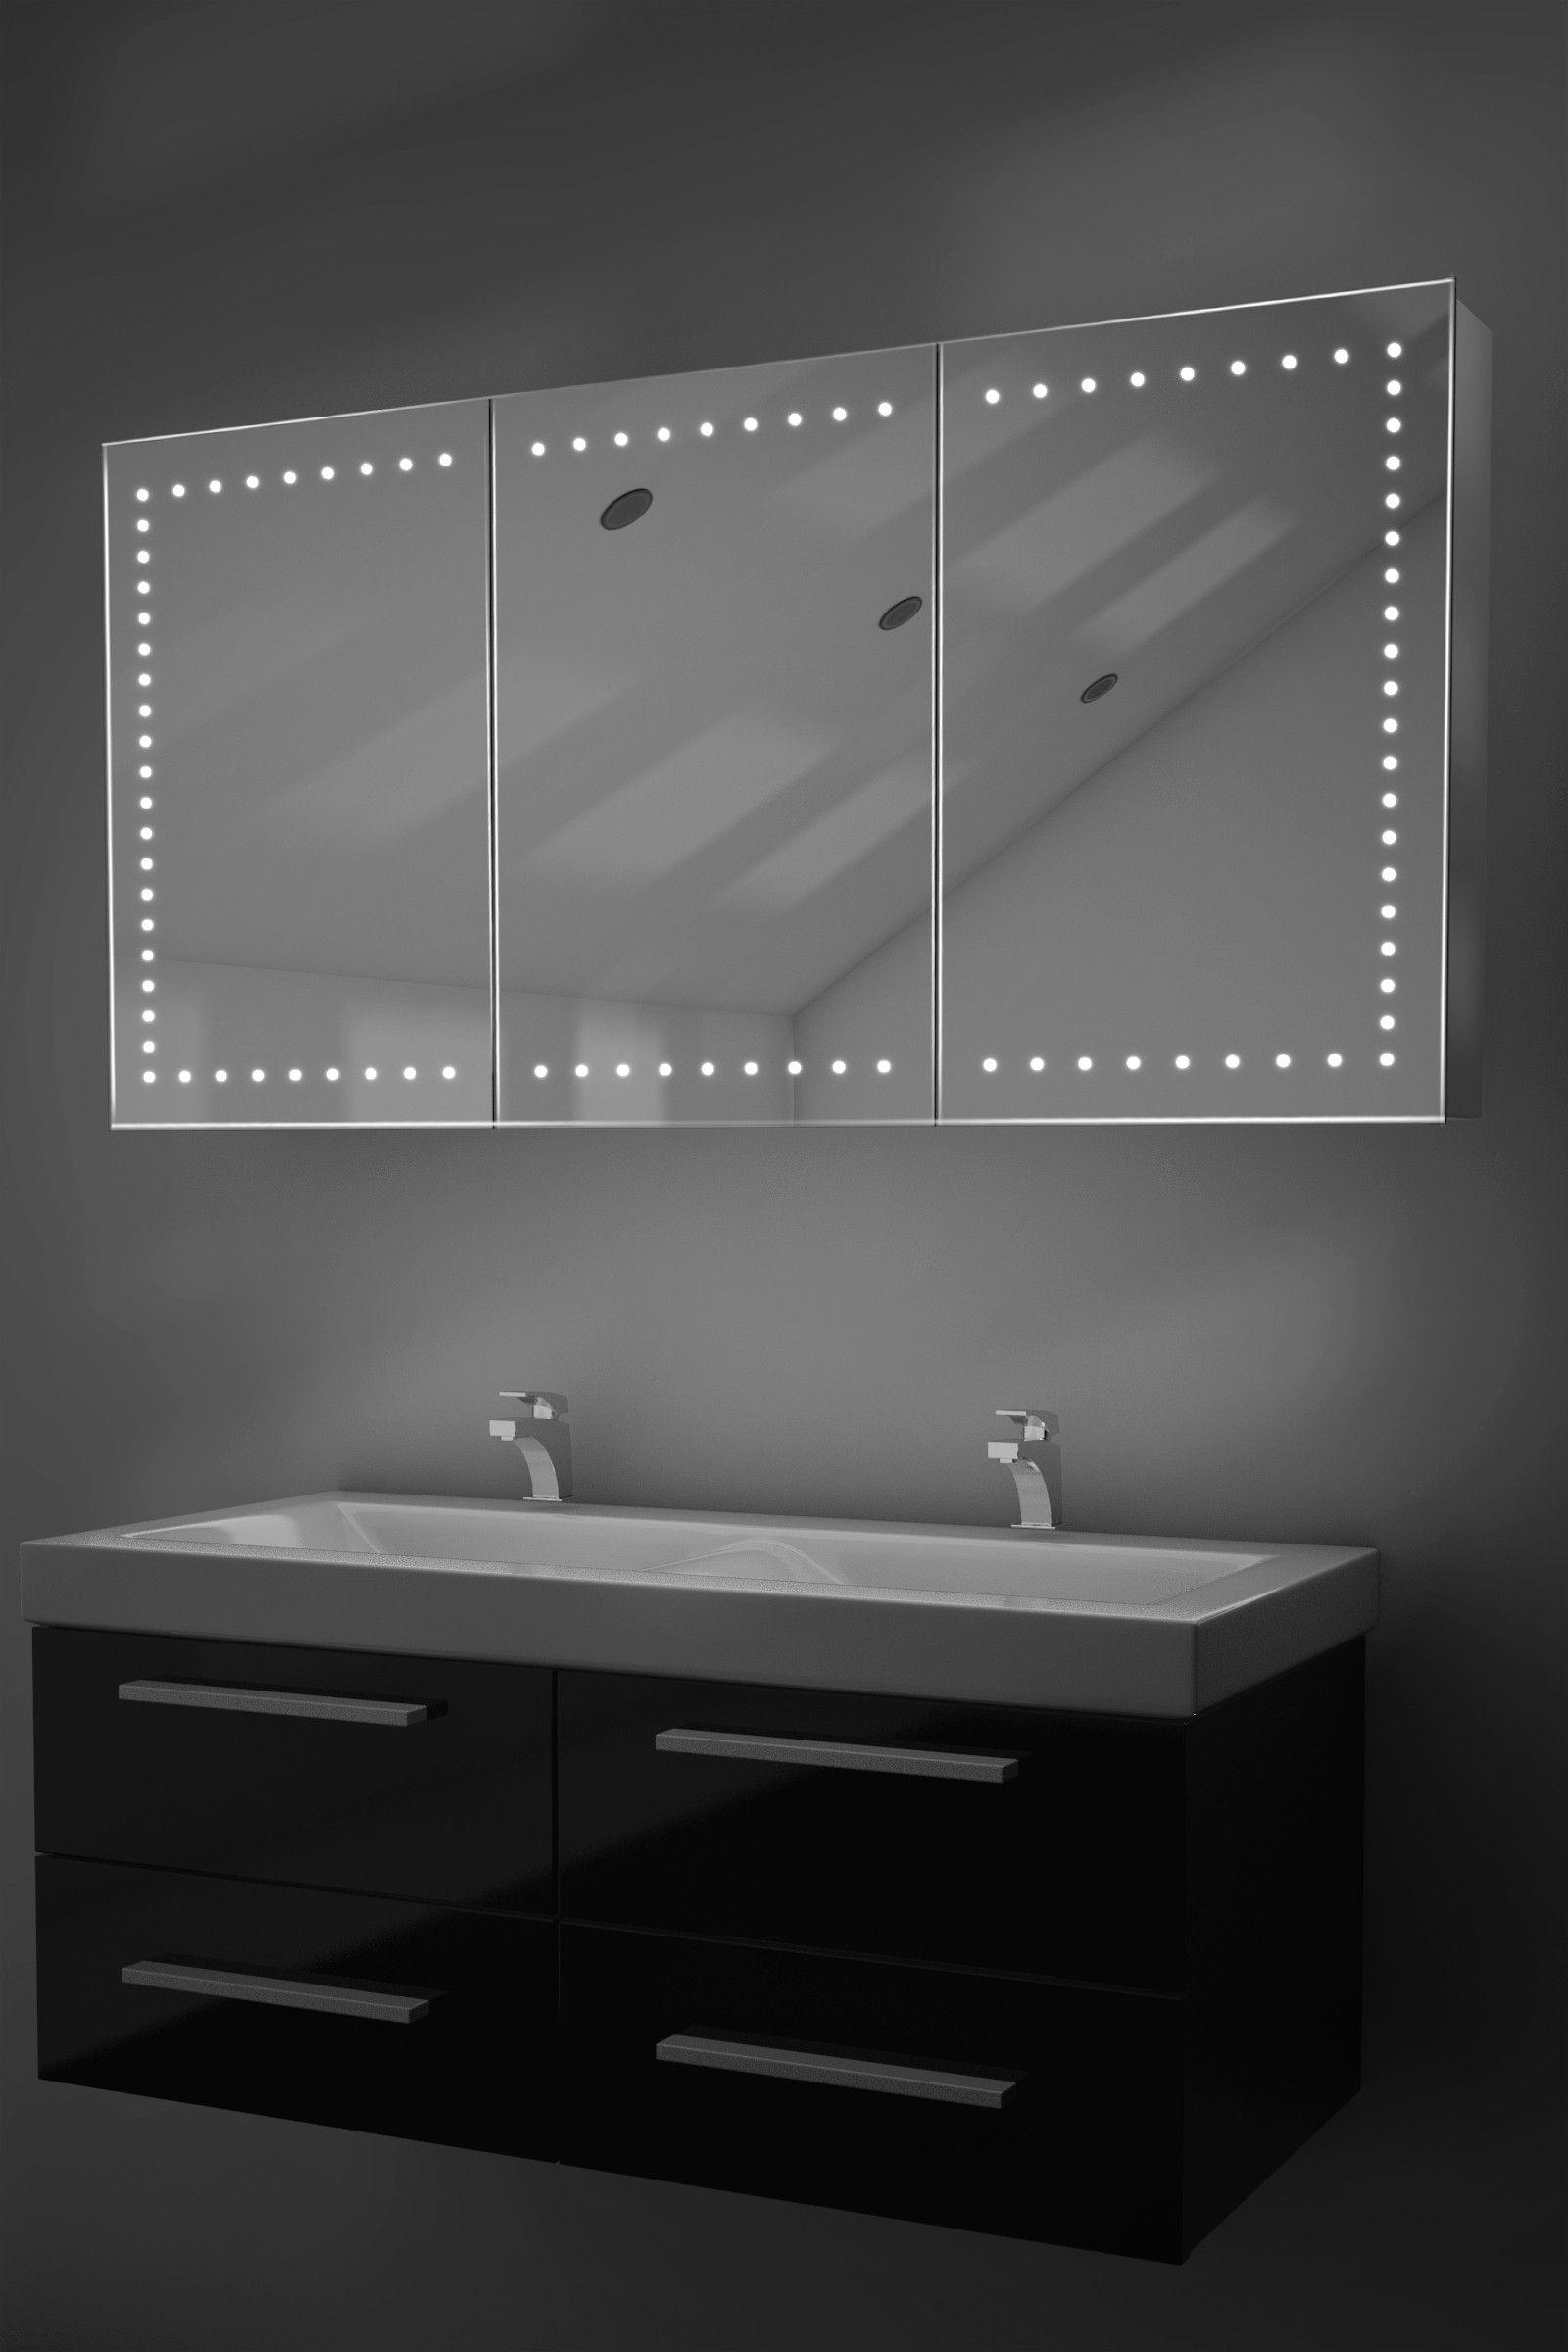 Spiegelschrank 120 Cm Integrierte Led Beleuchtung Doppelt Verspiegelt